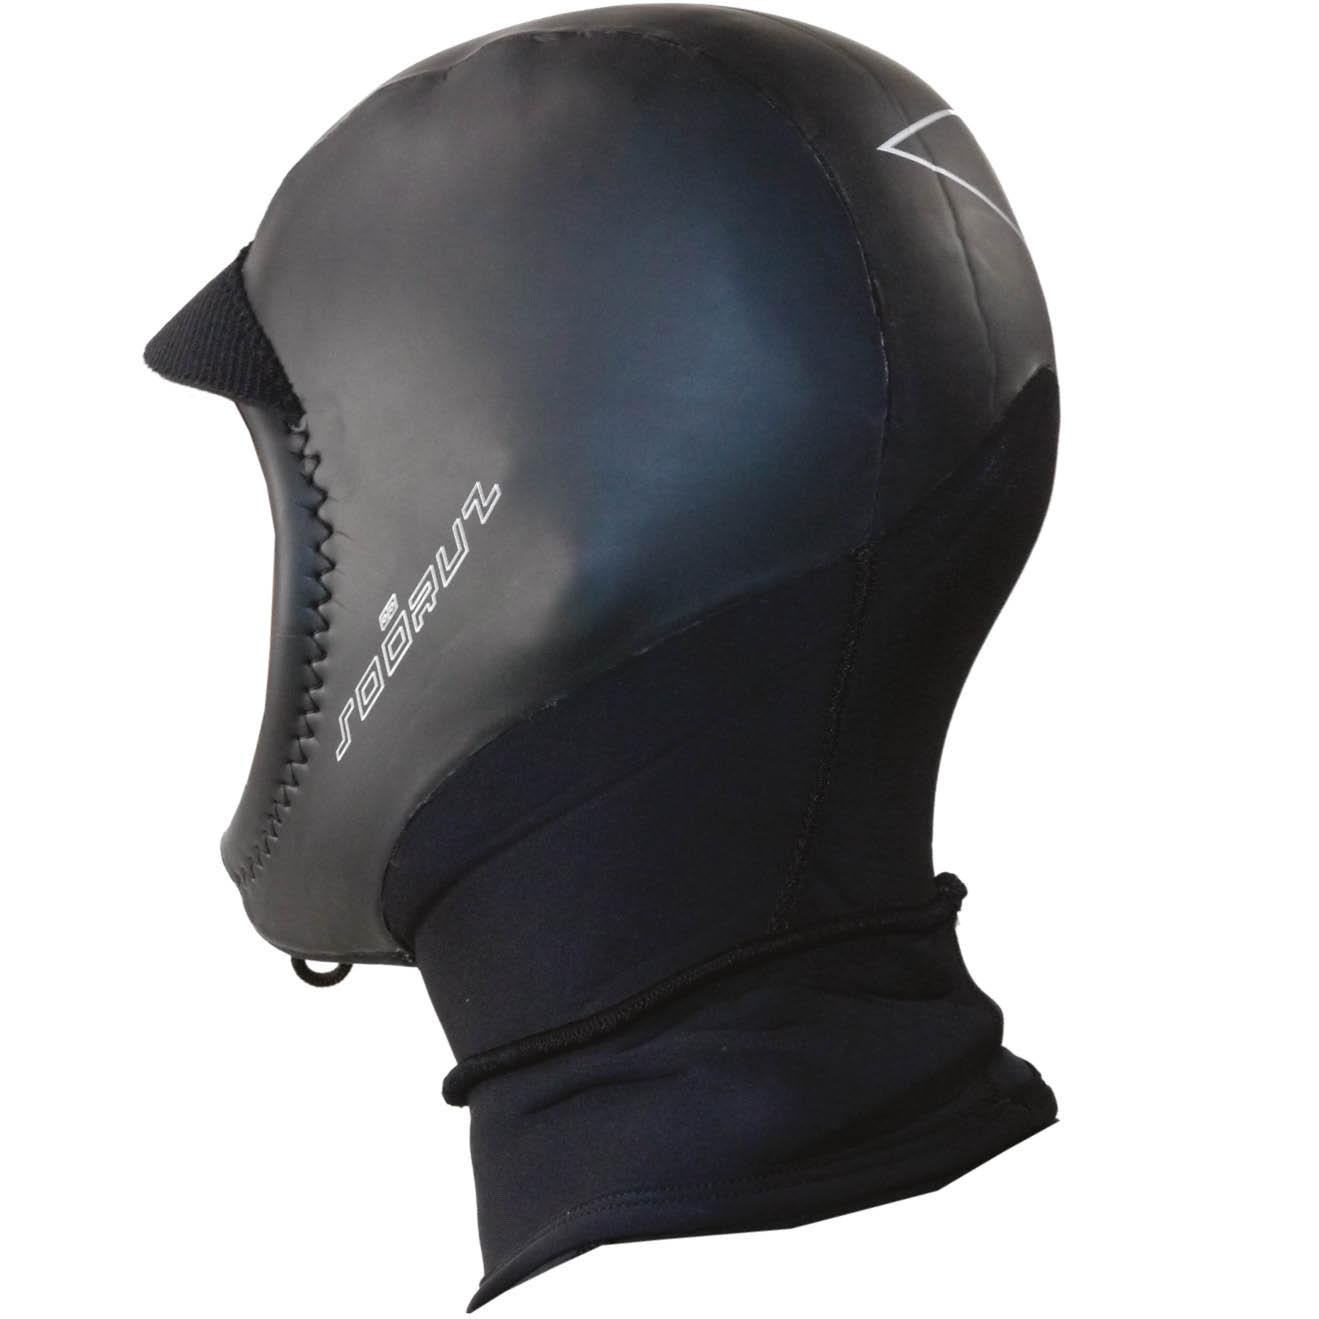 Söoruz Neoprenhaube Hood-6260